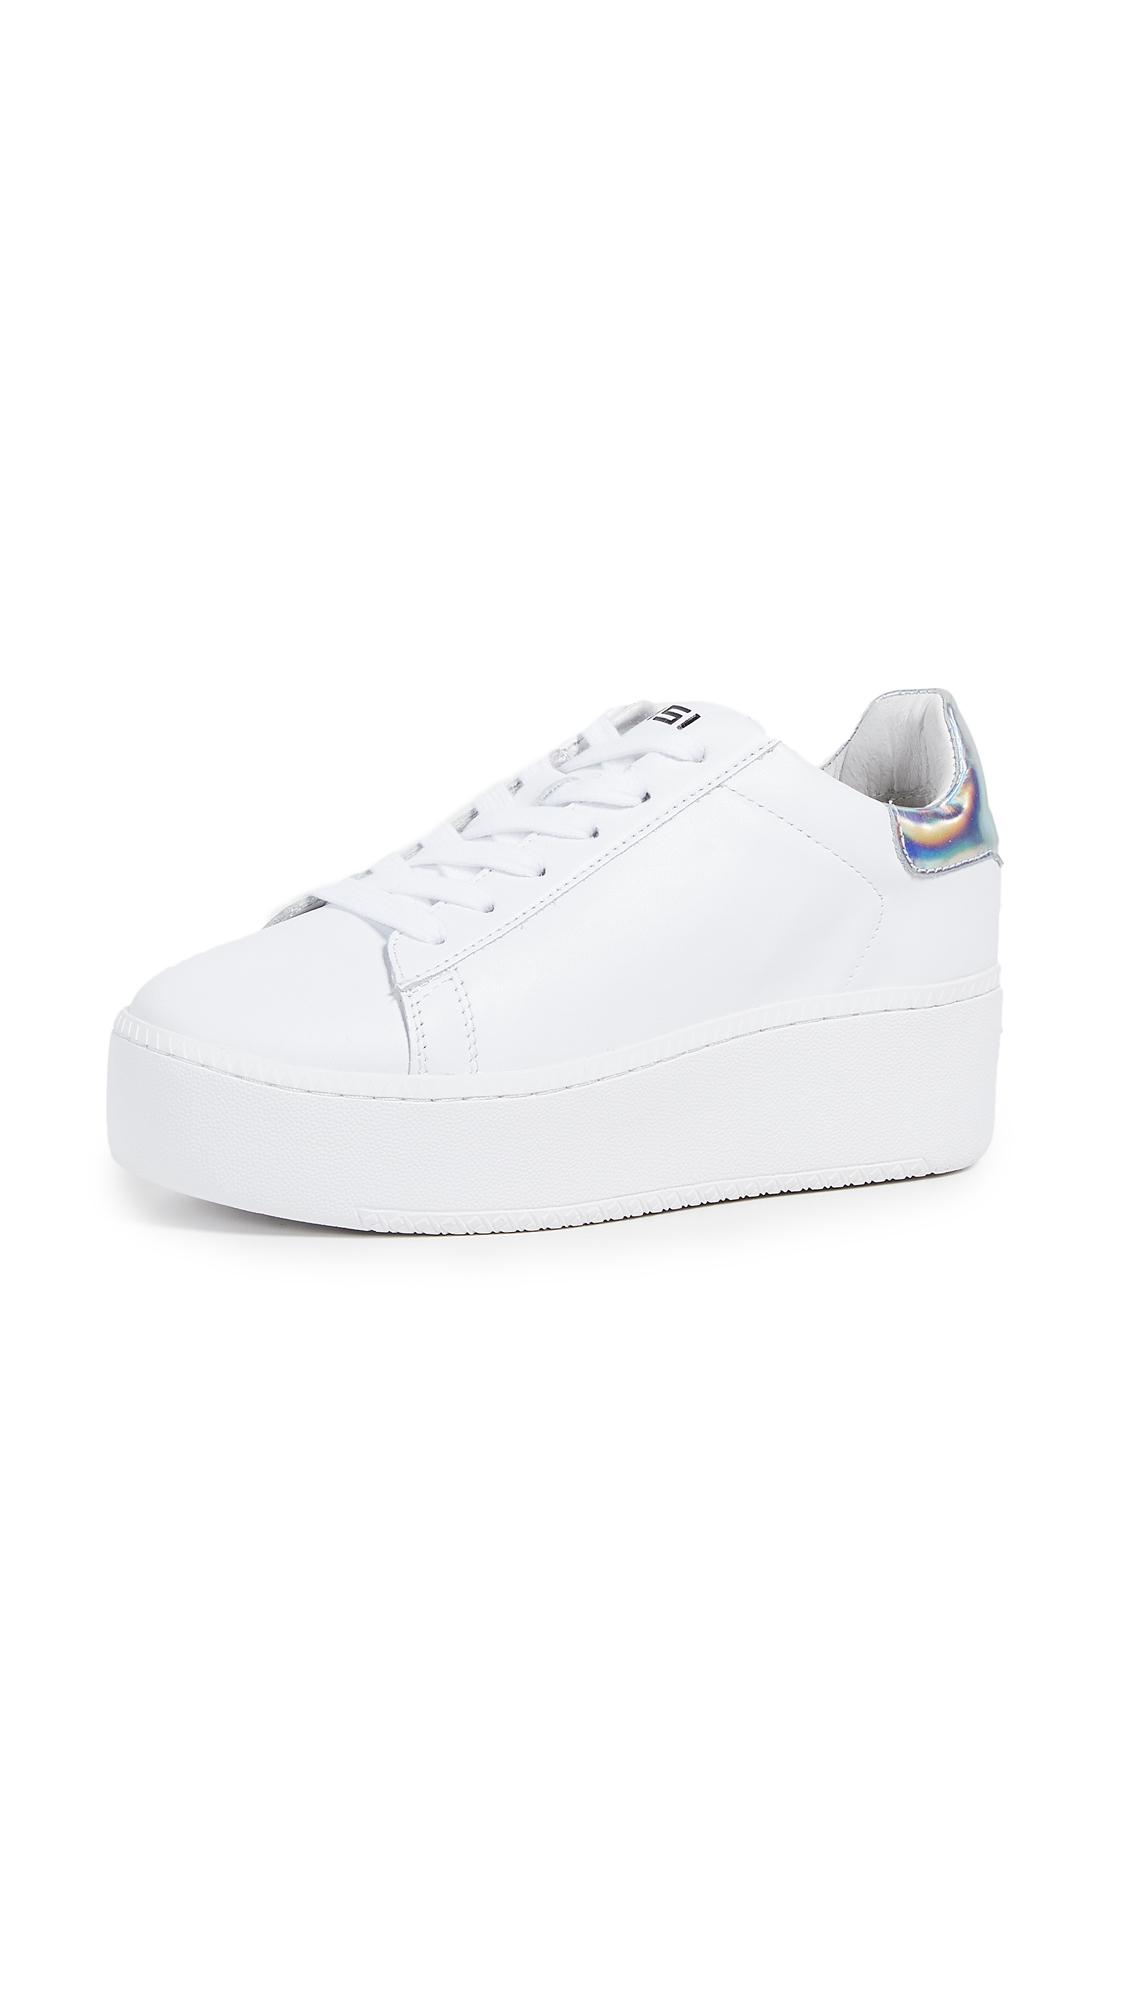 Ash Cult Platform Sneakers - White/Rainbow Silver